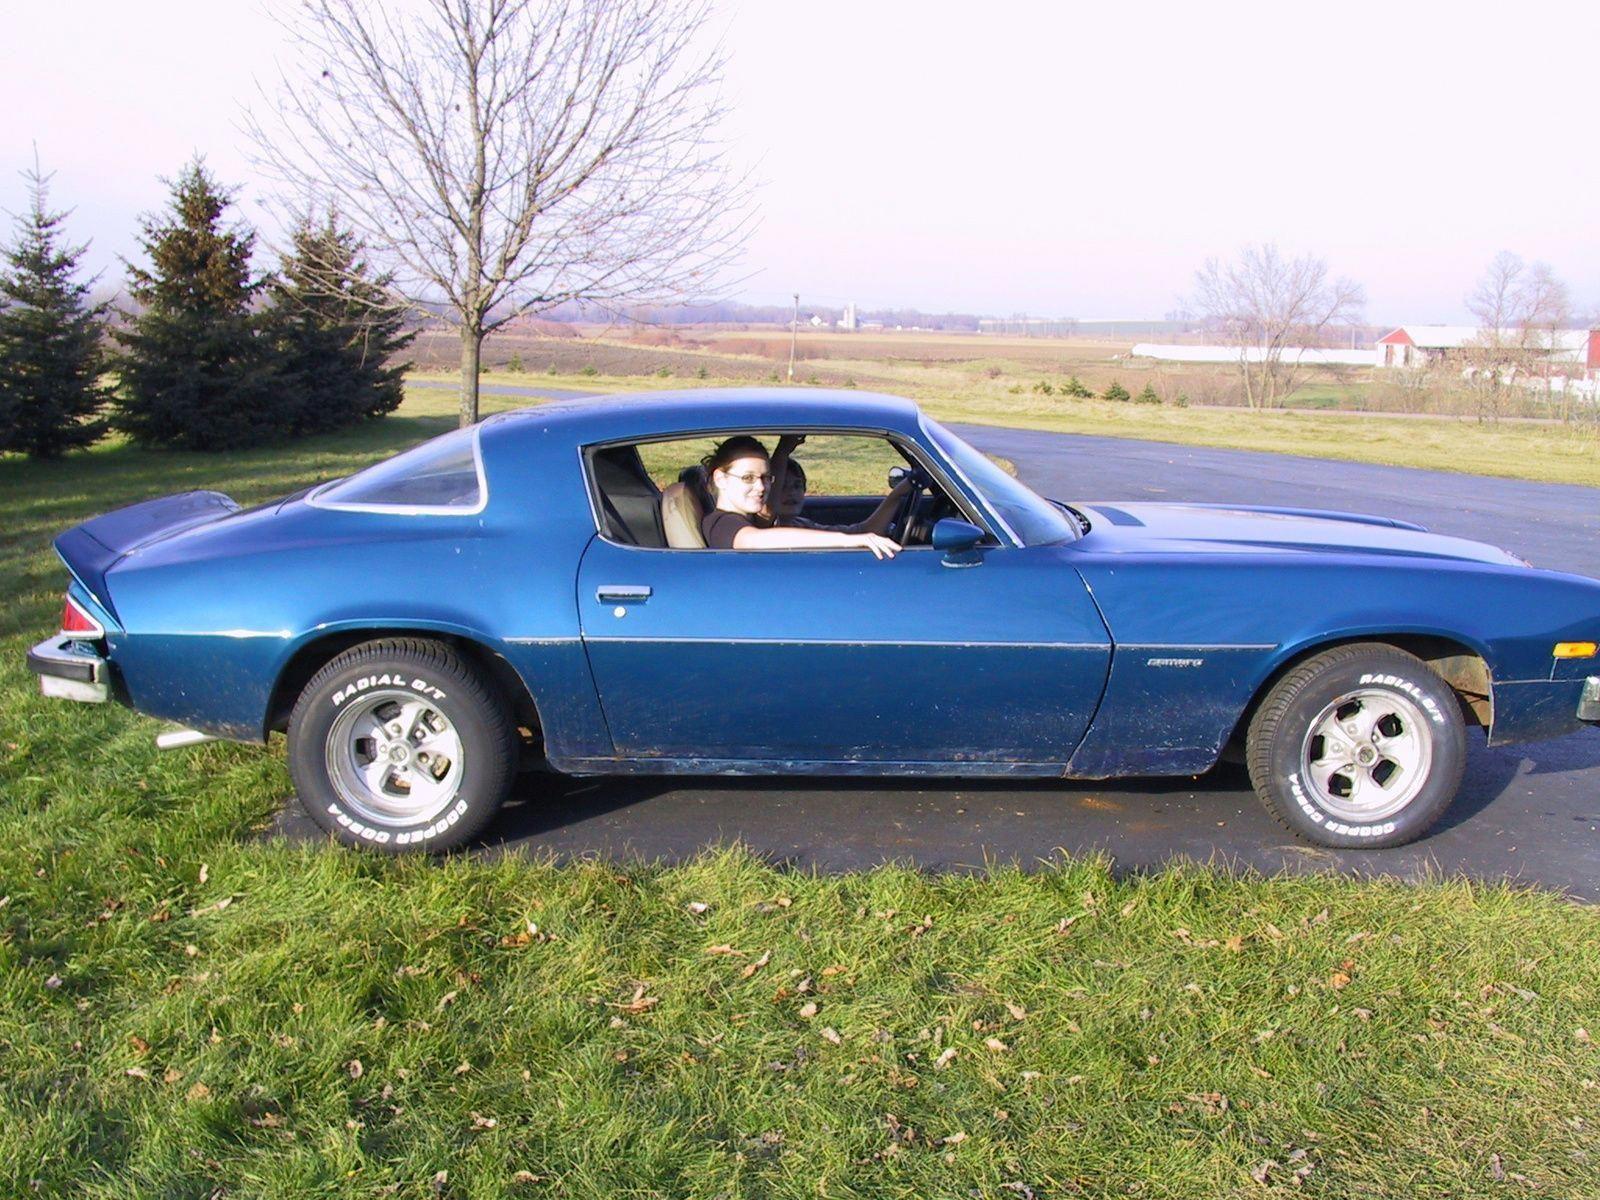 medium resolution of 1976 chevrolet camaro the first car i ever purchased bluecamaro